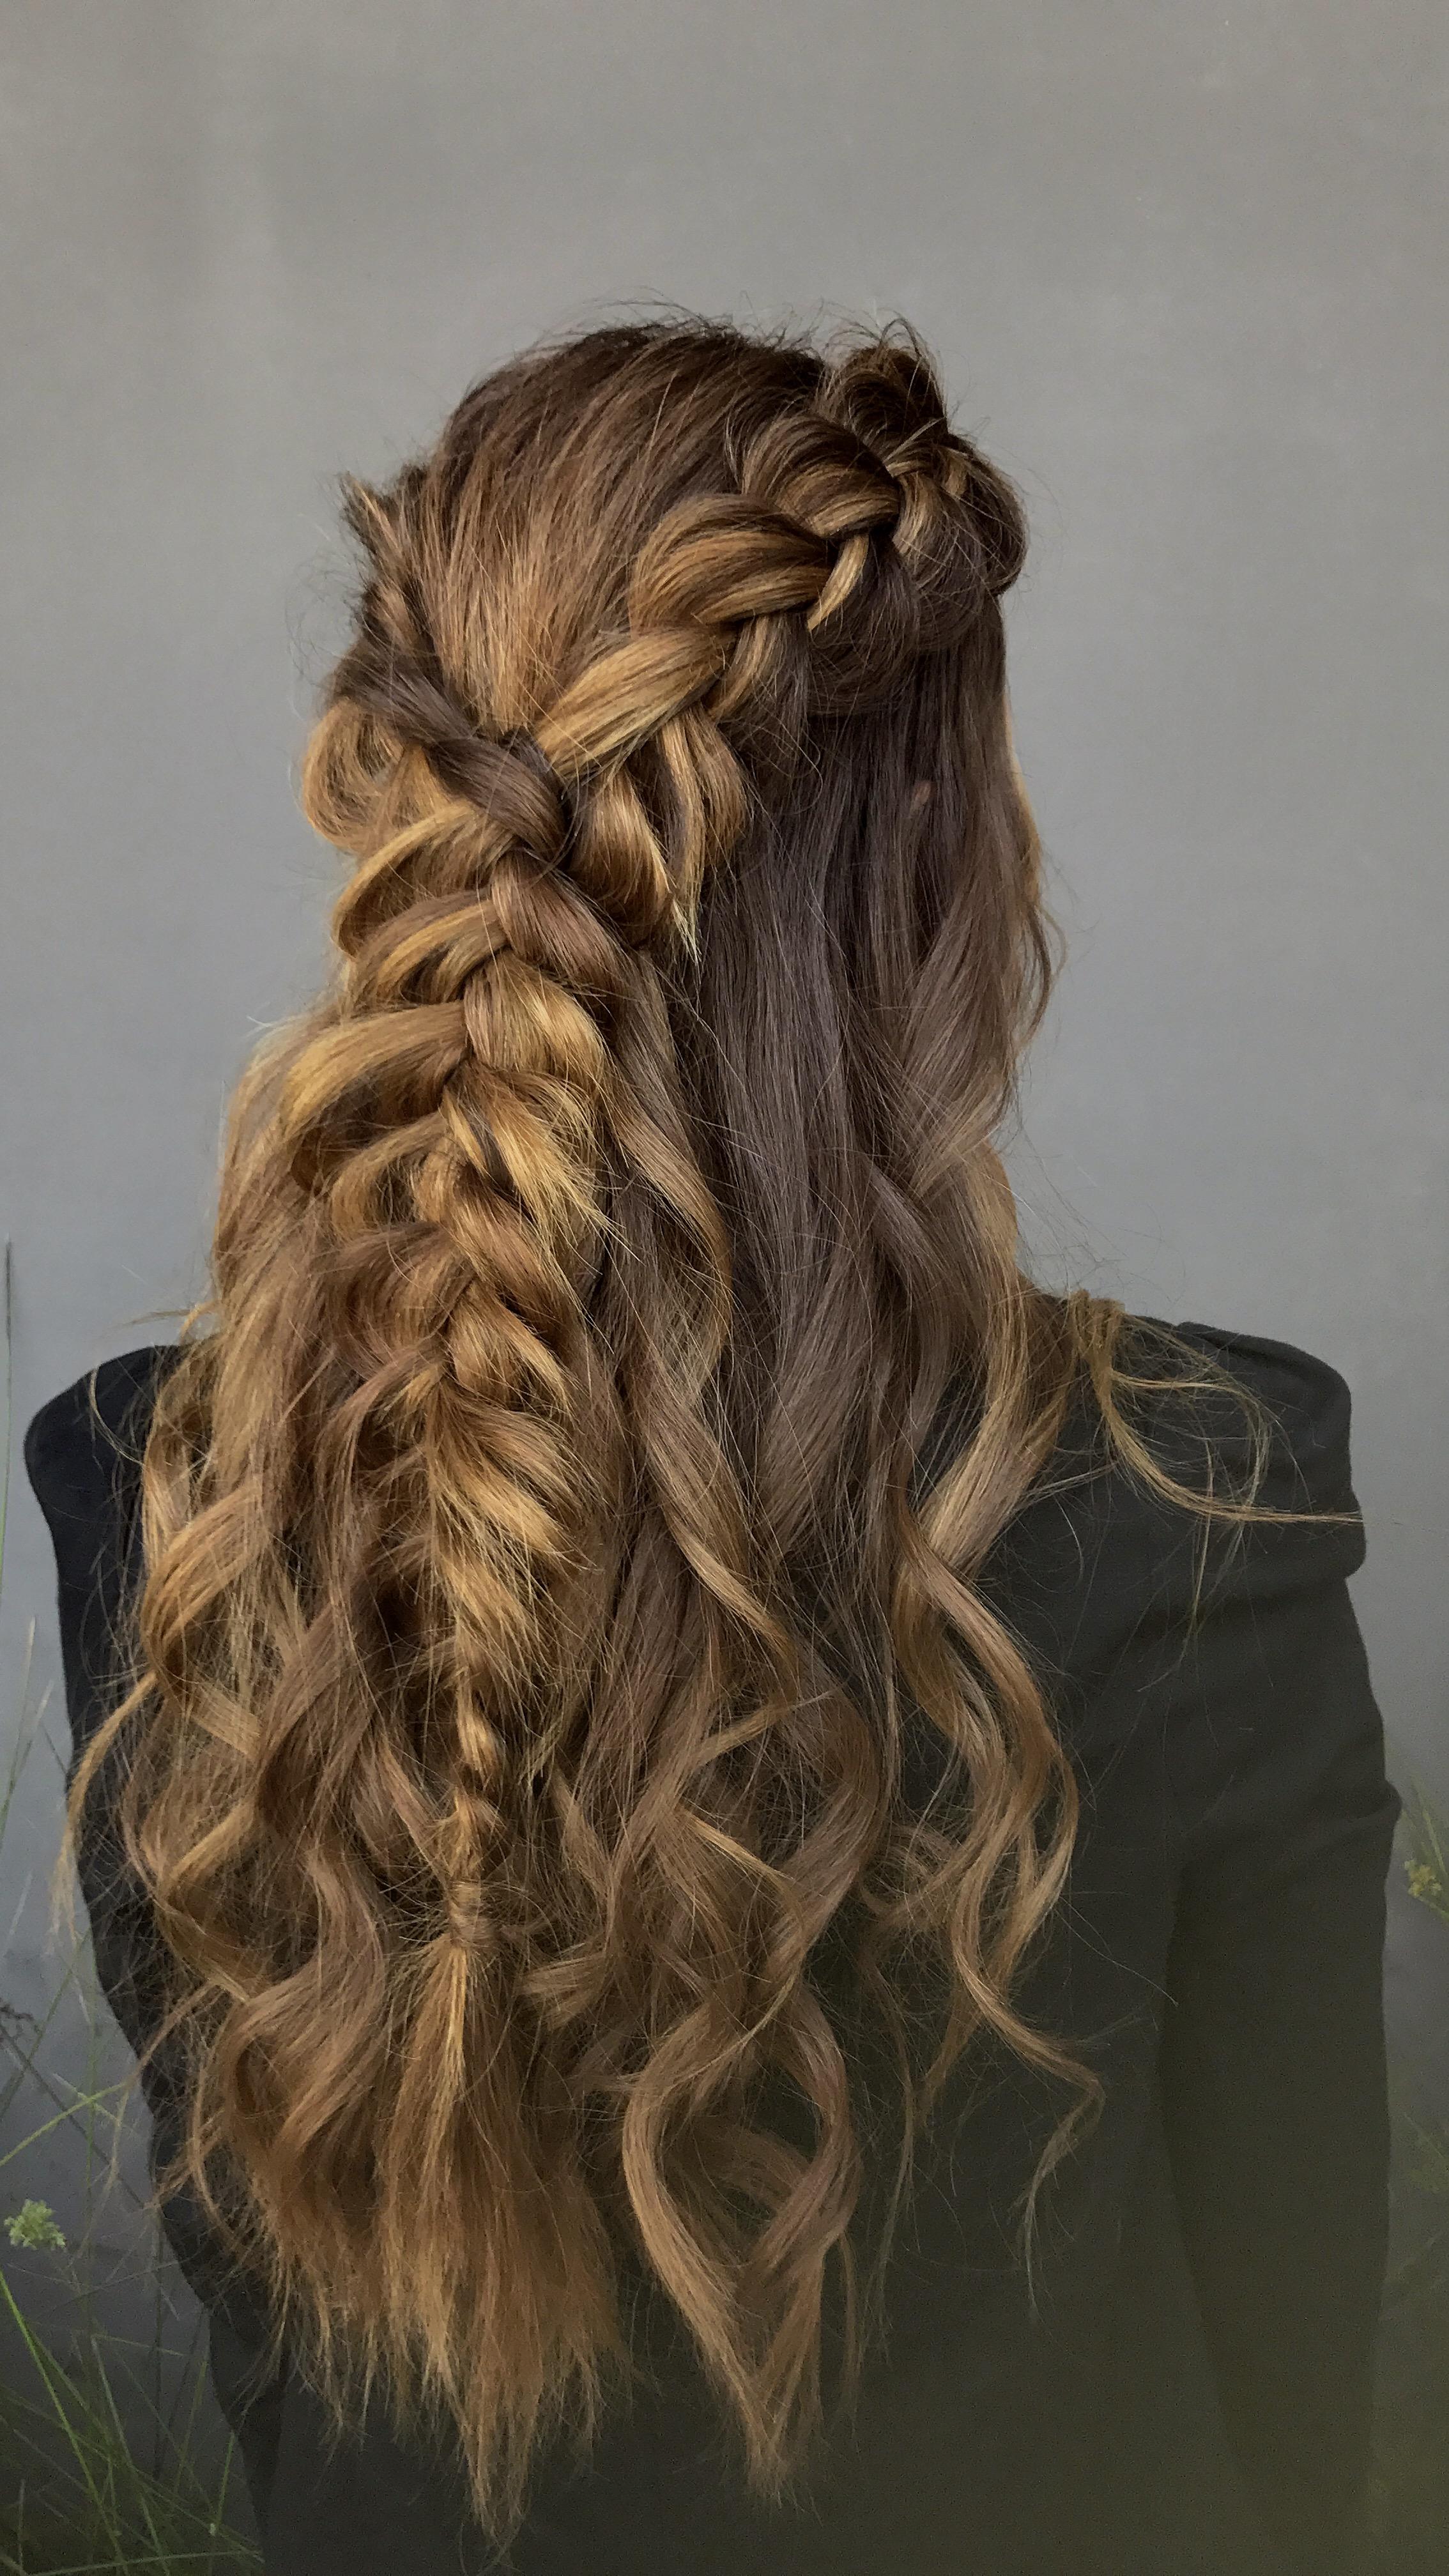 My Top 5 Hair Tips Lydia Mclaughlin Oc Lydia